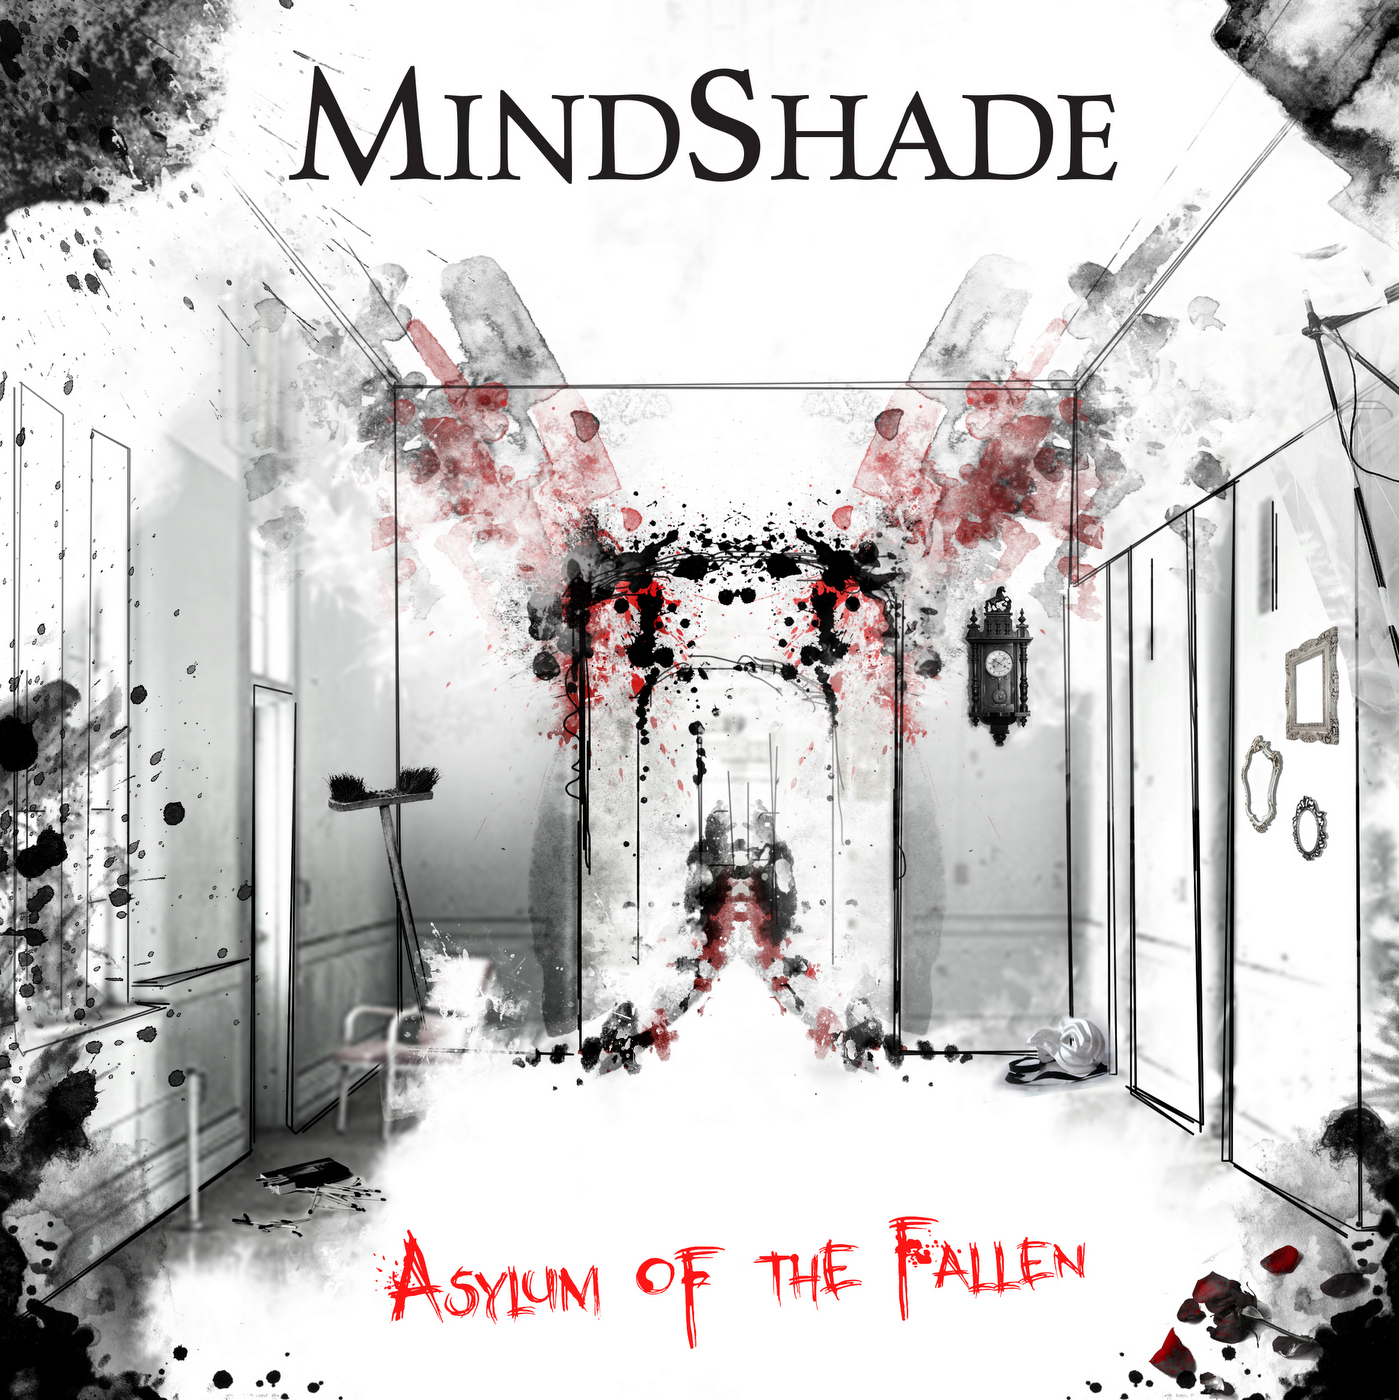 MindShade | Asylum Of The Fallen (album review) ★★★★☆